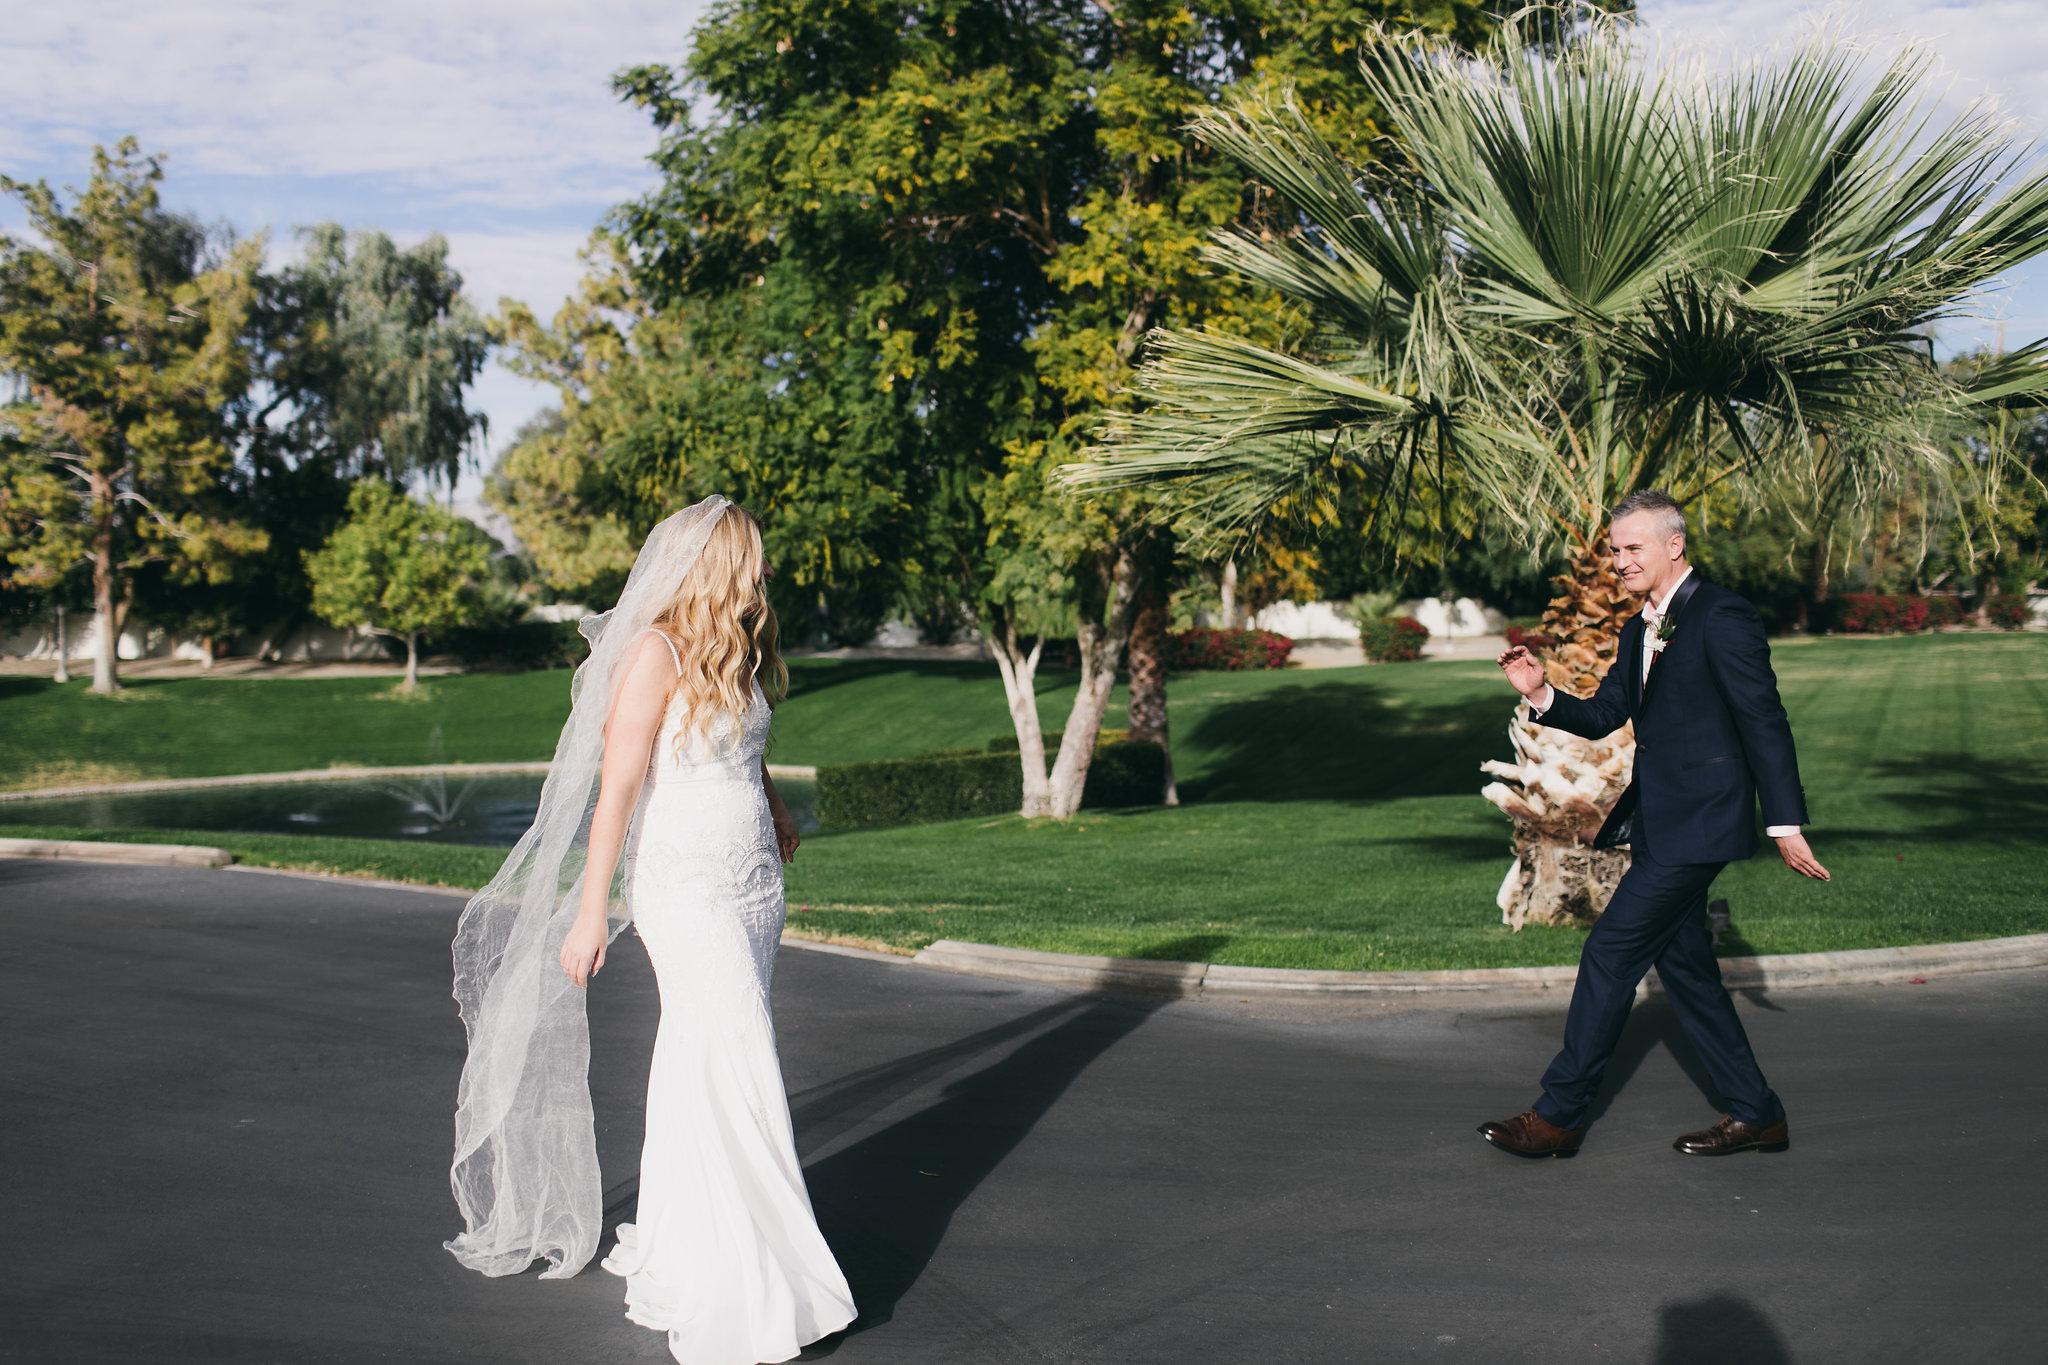 Gracy-Andrew-Wedding-146.jpg